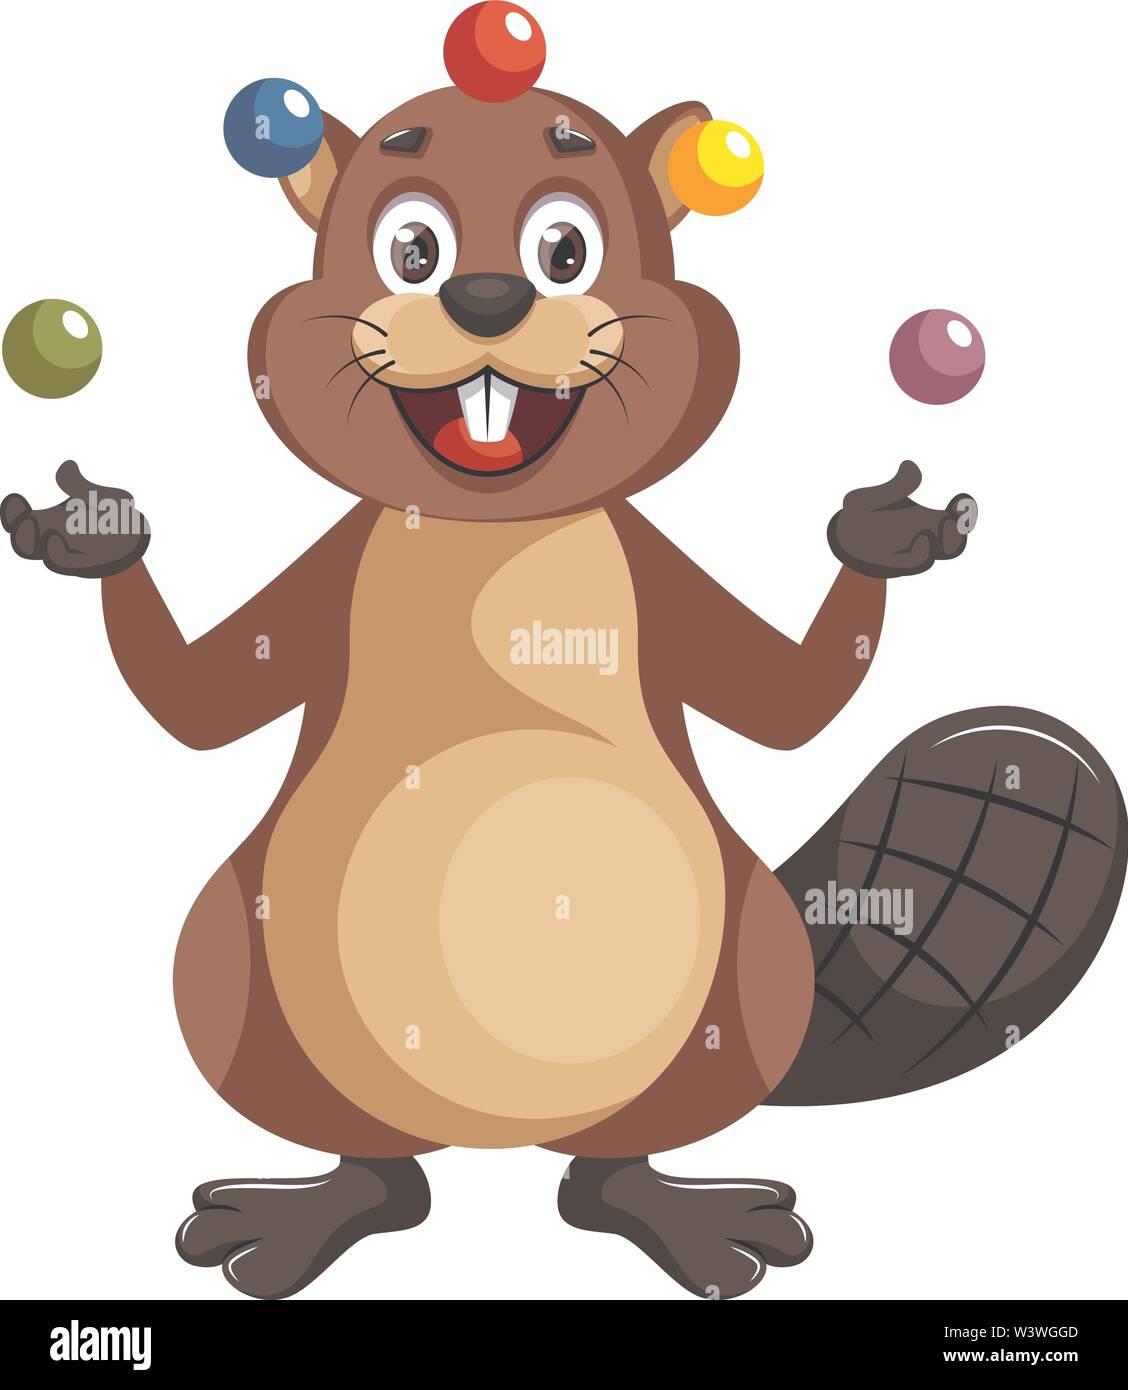 Beaver juggling, illustration, vector on white background. - Stock Image